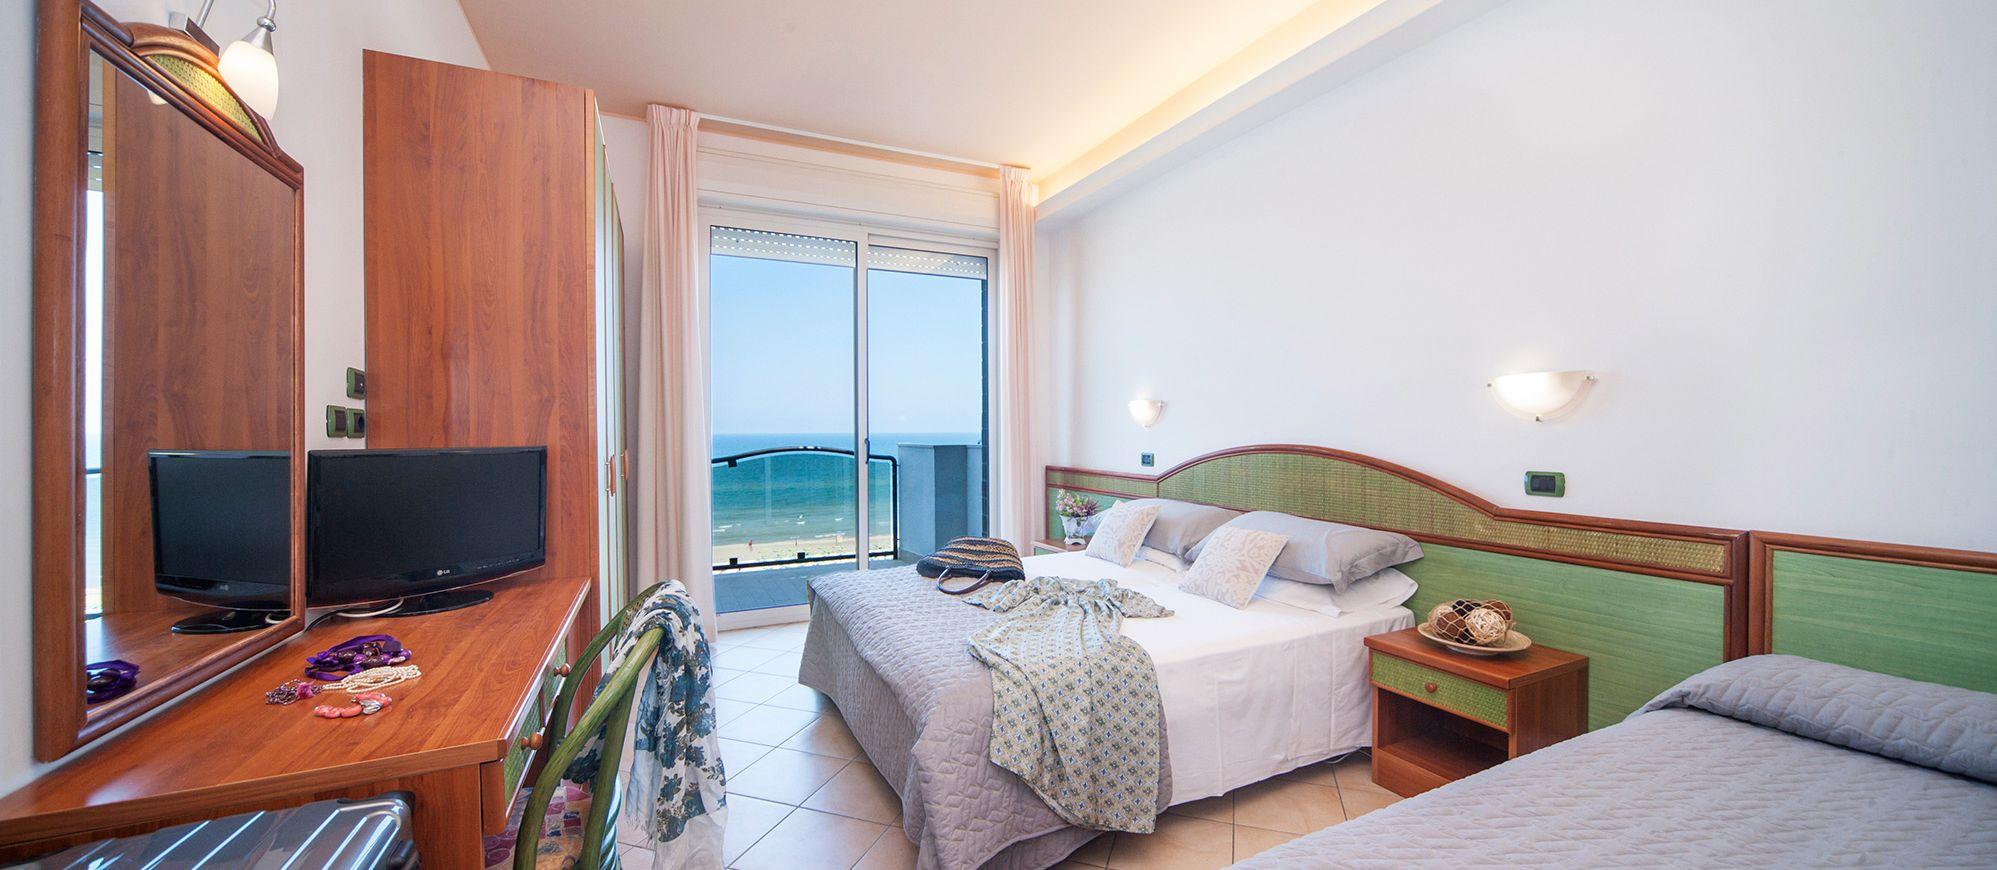 Zimmer Meerblick Familenurlaub Abruzzen | Hotel Promenade